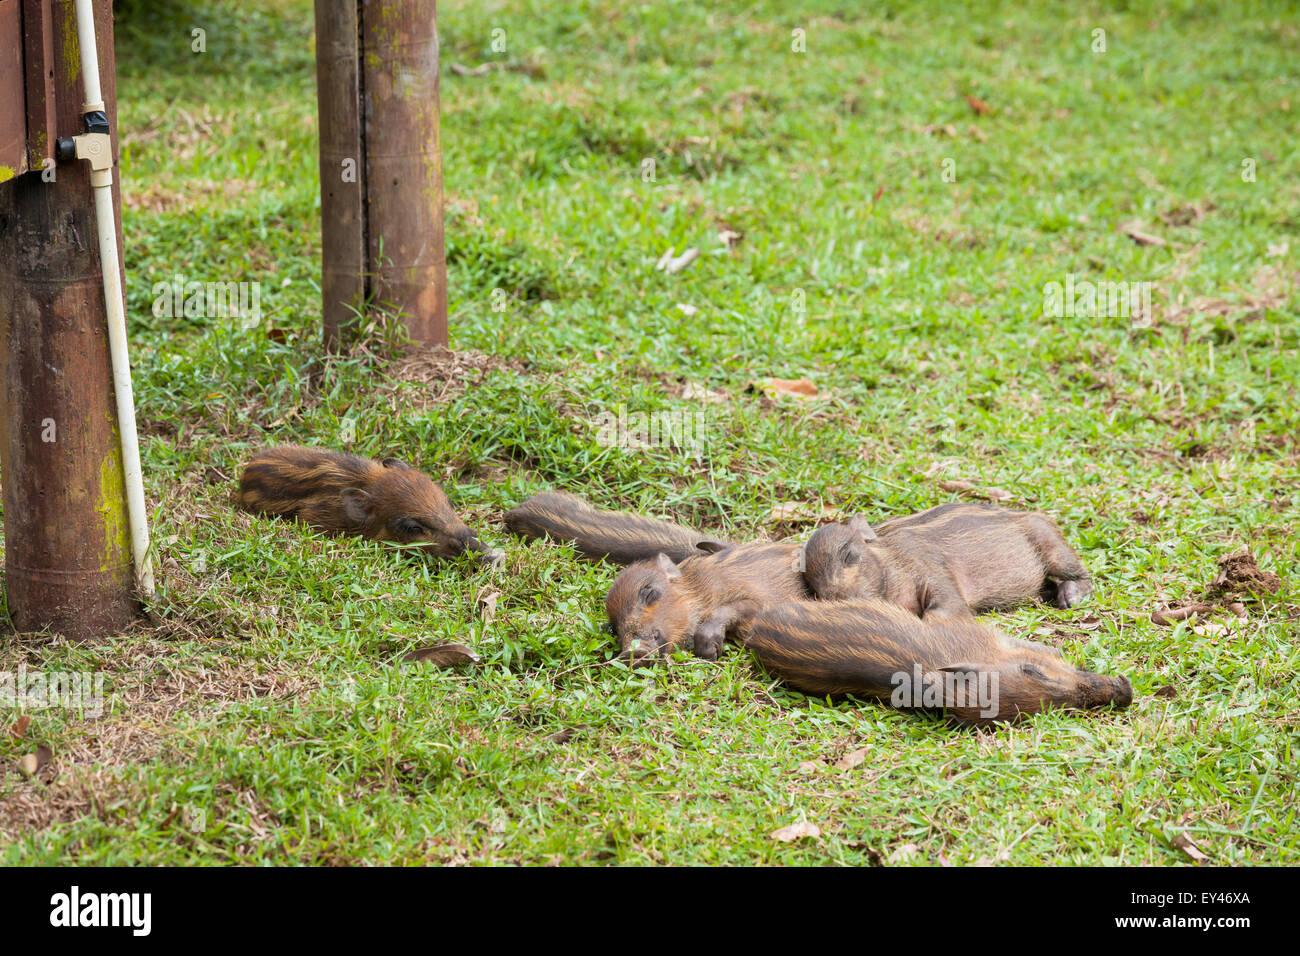 Baby wild boars sleeping on grass - Stock Image